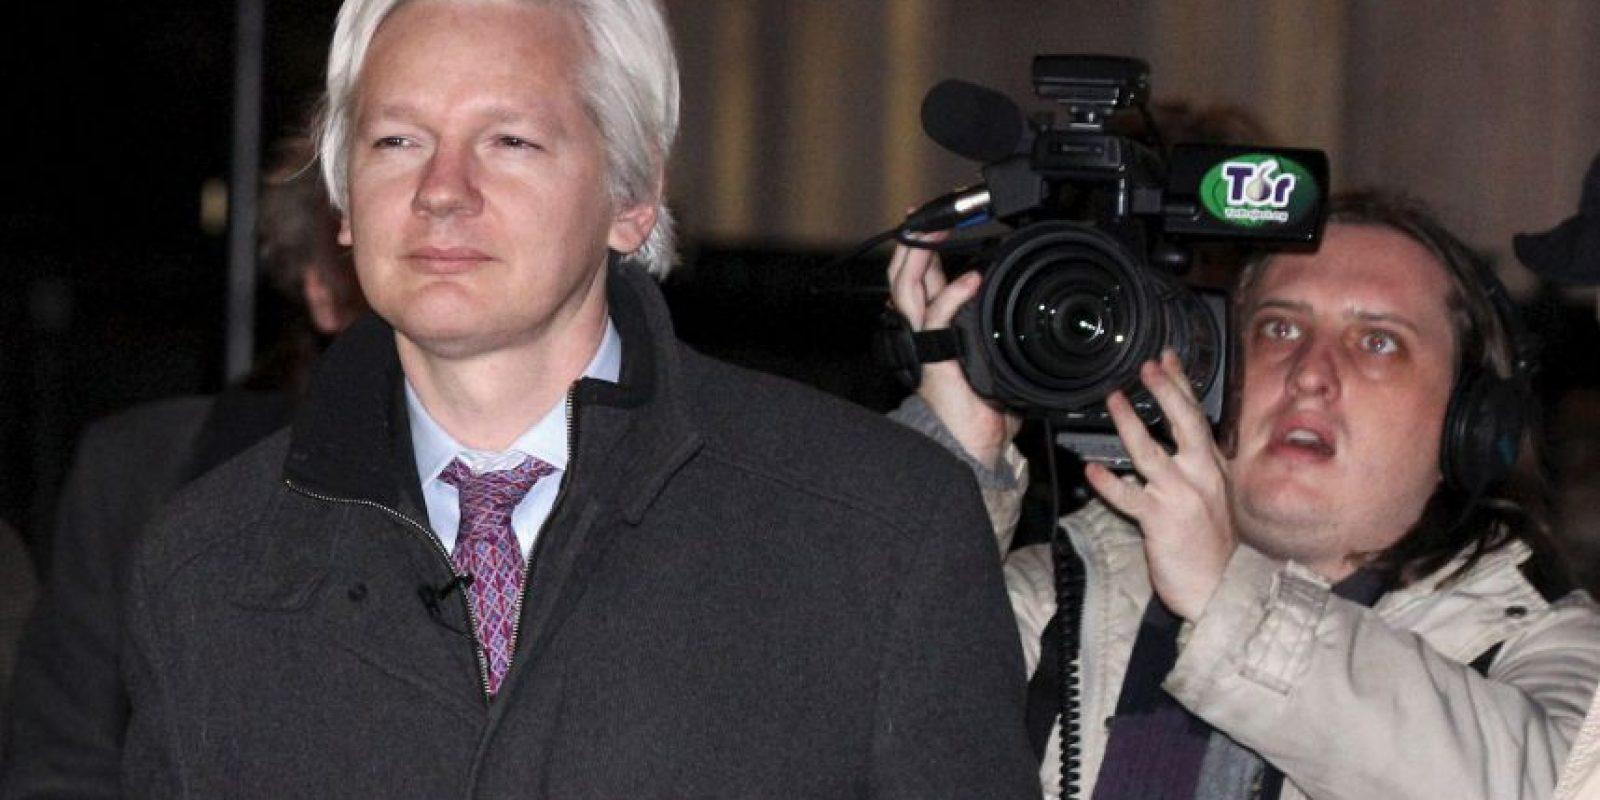 Donde se le acusa de haber cometido abusos sexuales. Foto:Getty Images